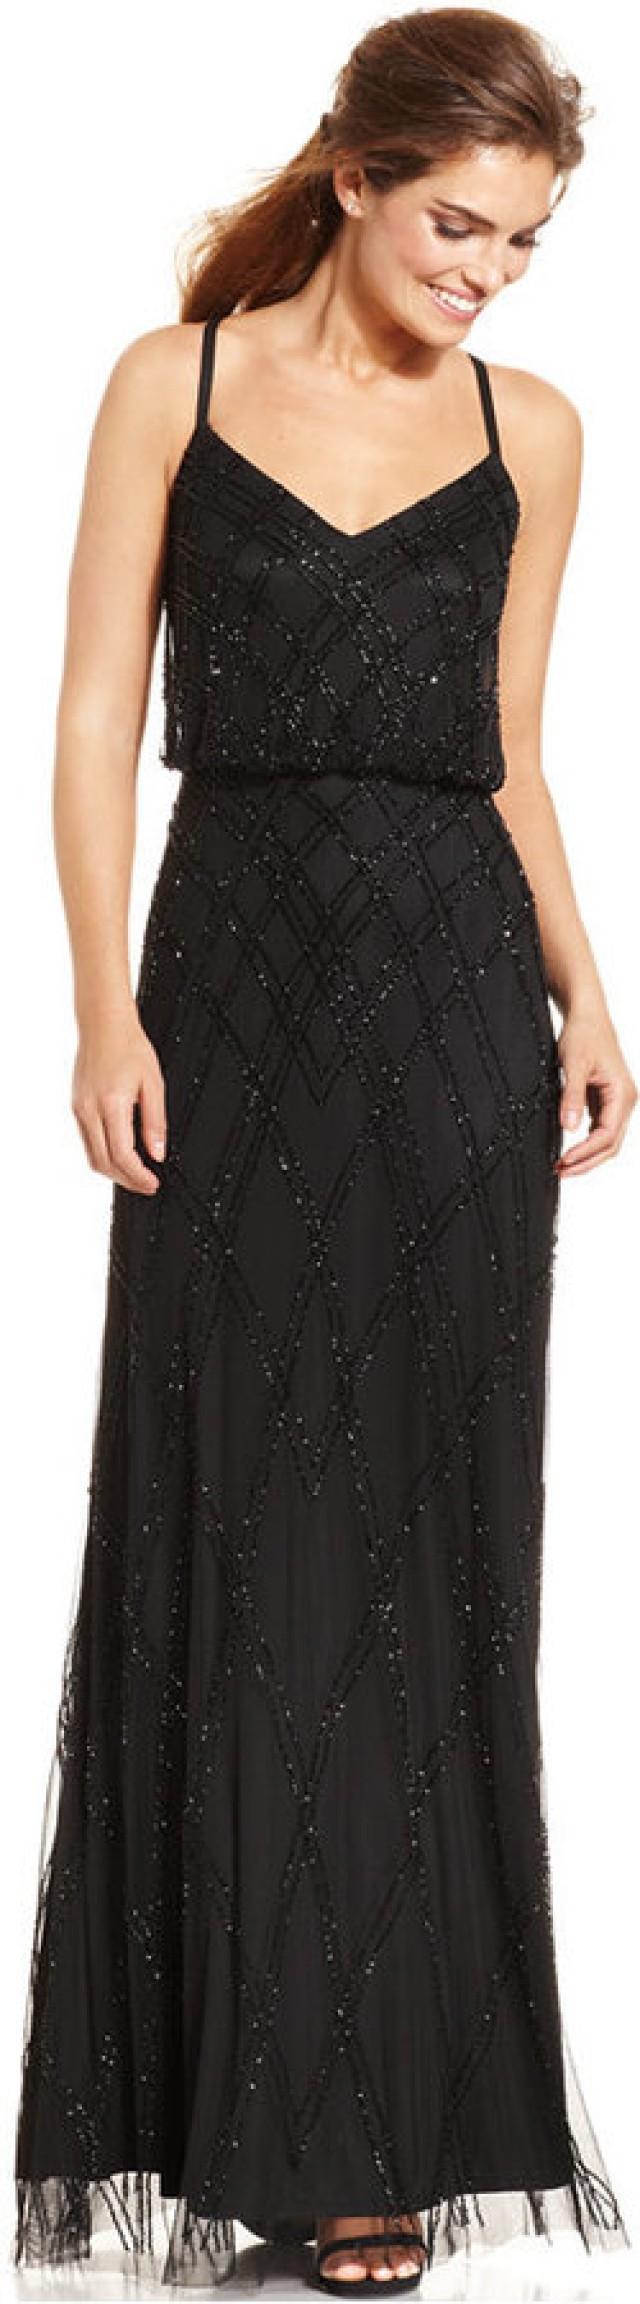 Adrianna Papell Sleeveless Beaded Blouson Gown #2196695 - Weddbook